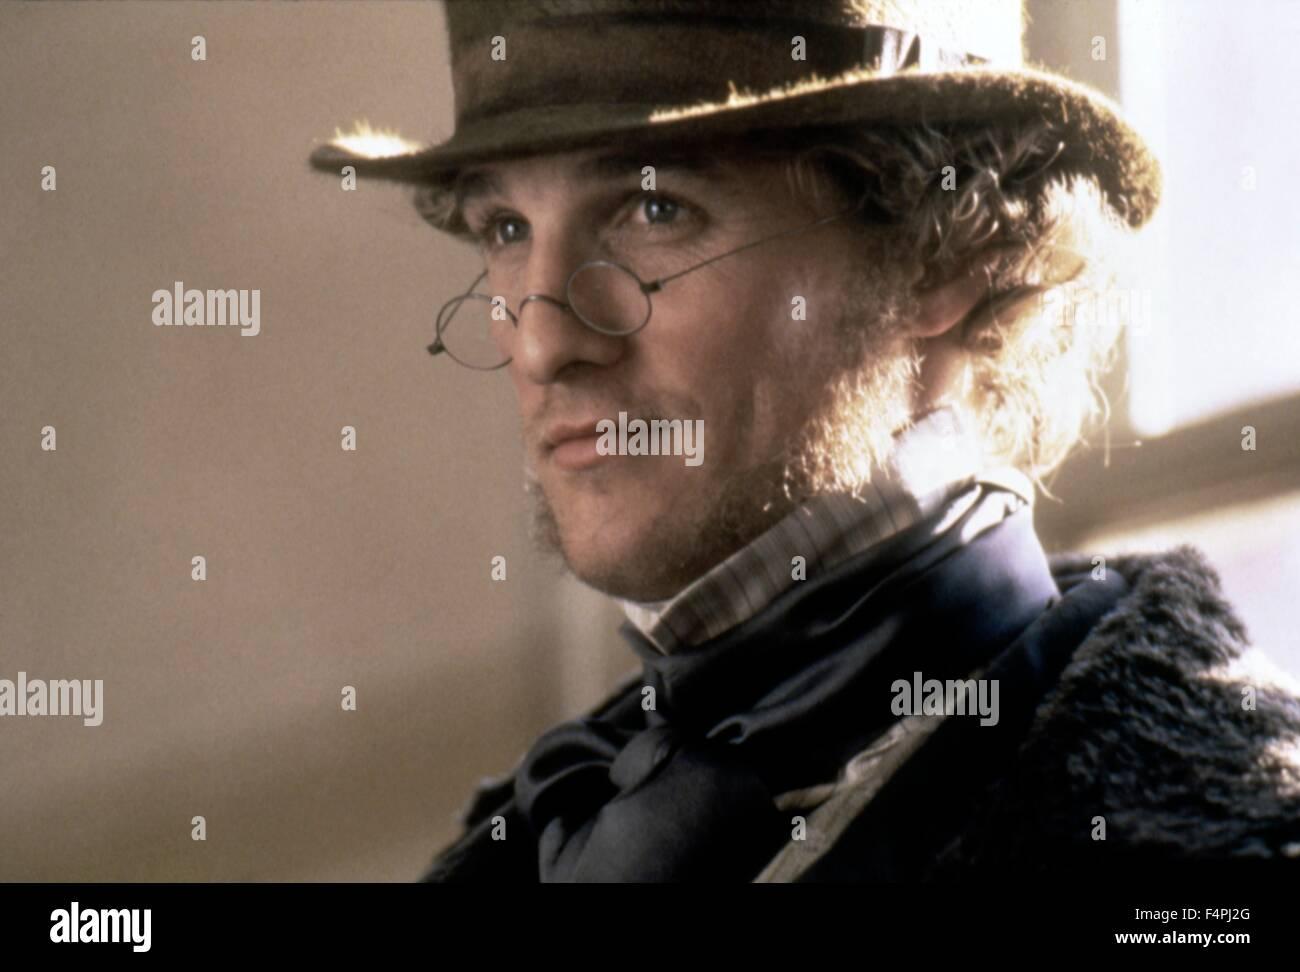 Matthew McConaughey / Amistad / 1997 dirigida por Steven Spielberg [Dreamworks Pictures] Imagen De Stock